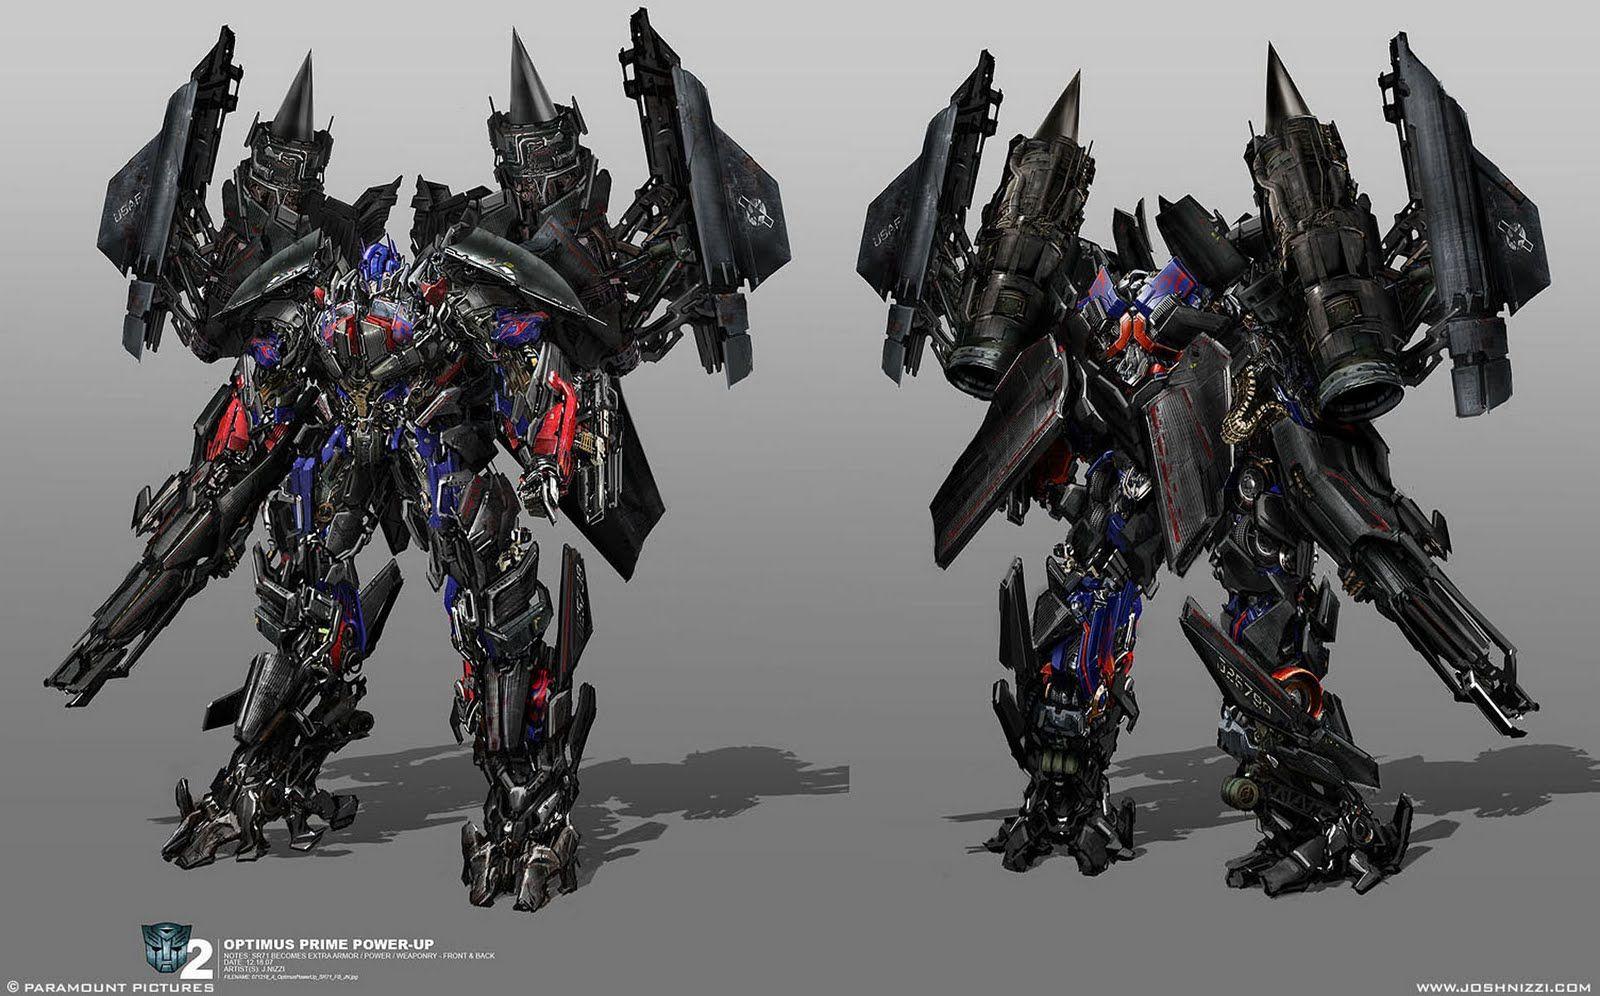 Optimus+Prime+flying+jet+mode+dotm+3+rotf+PowerUp+jet+fire ...